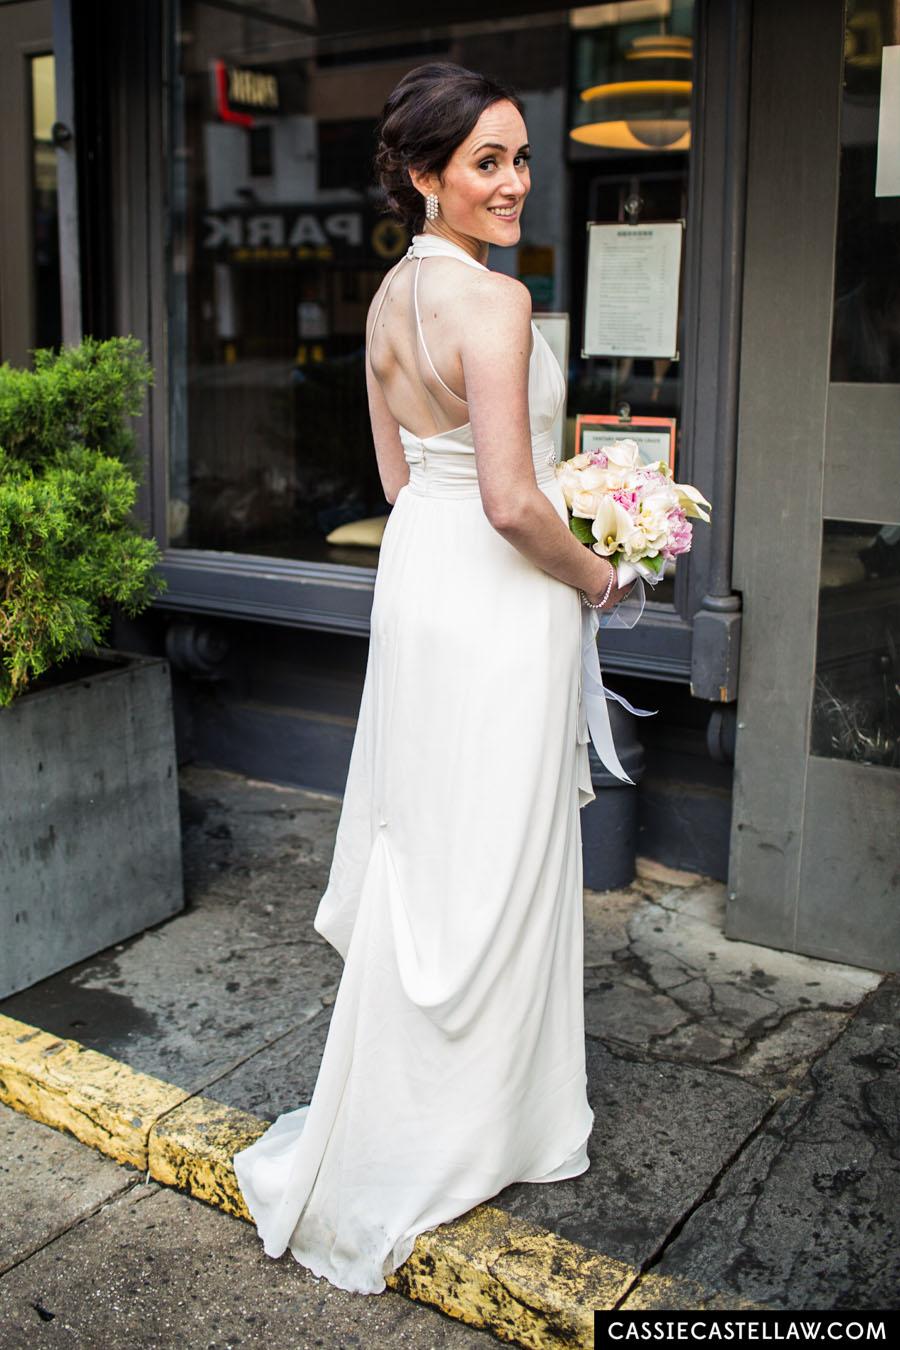 bottino-wedding-nyc-chelsea_cassiecastellaw.com-091.JPG